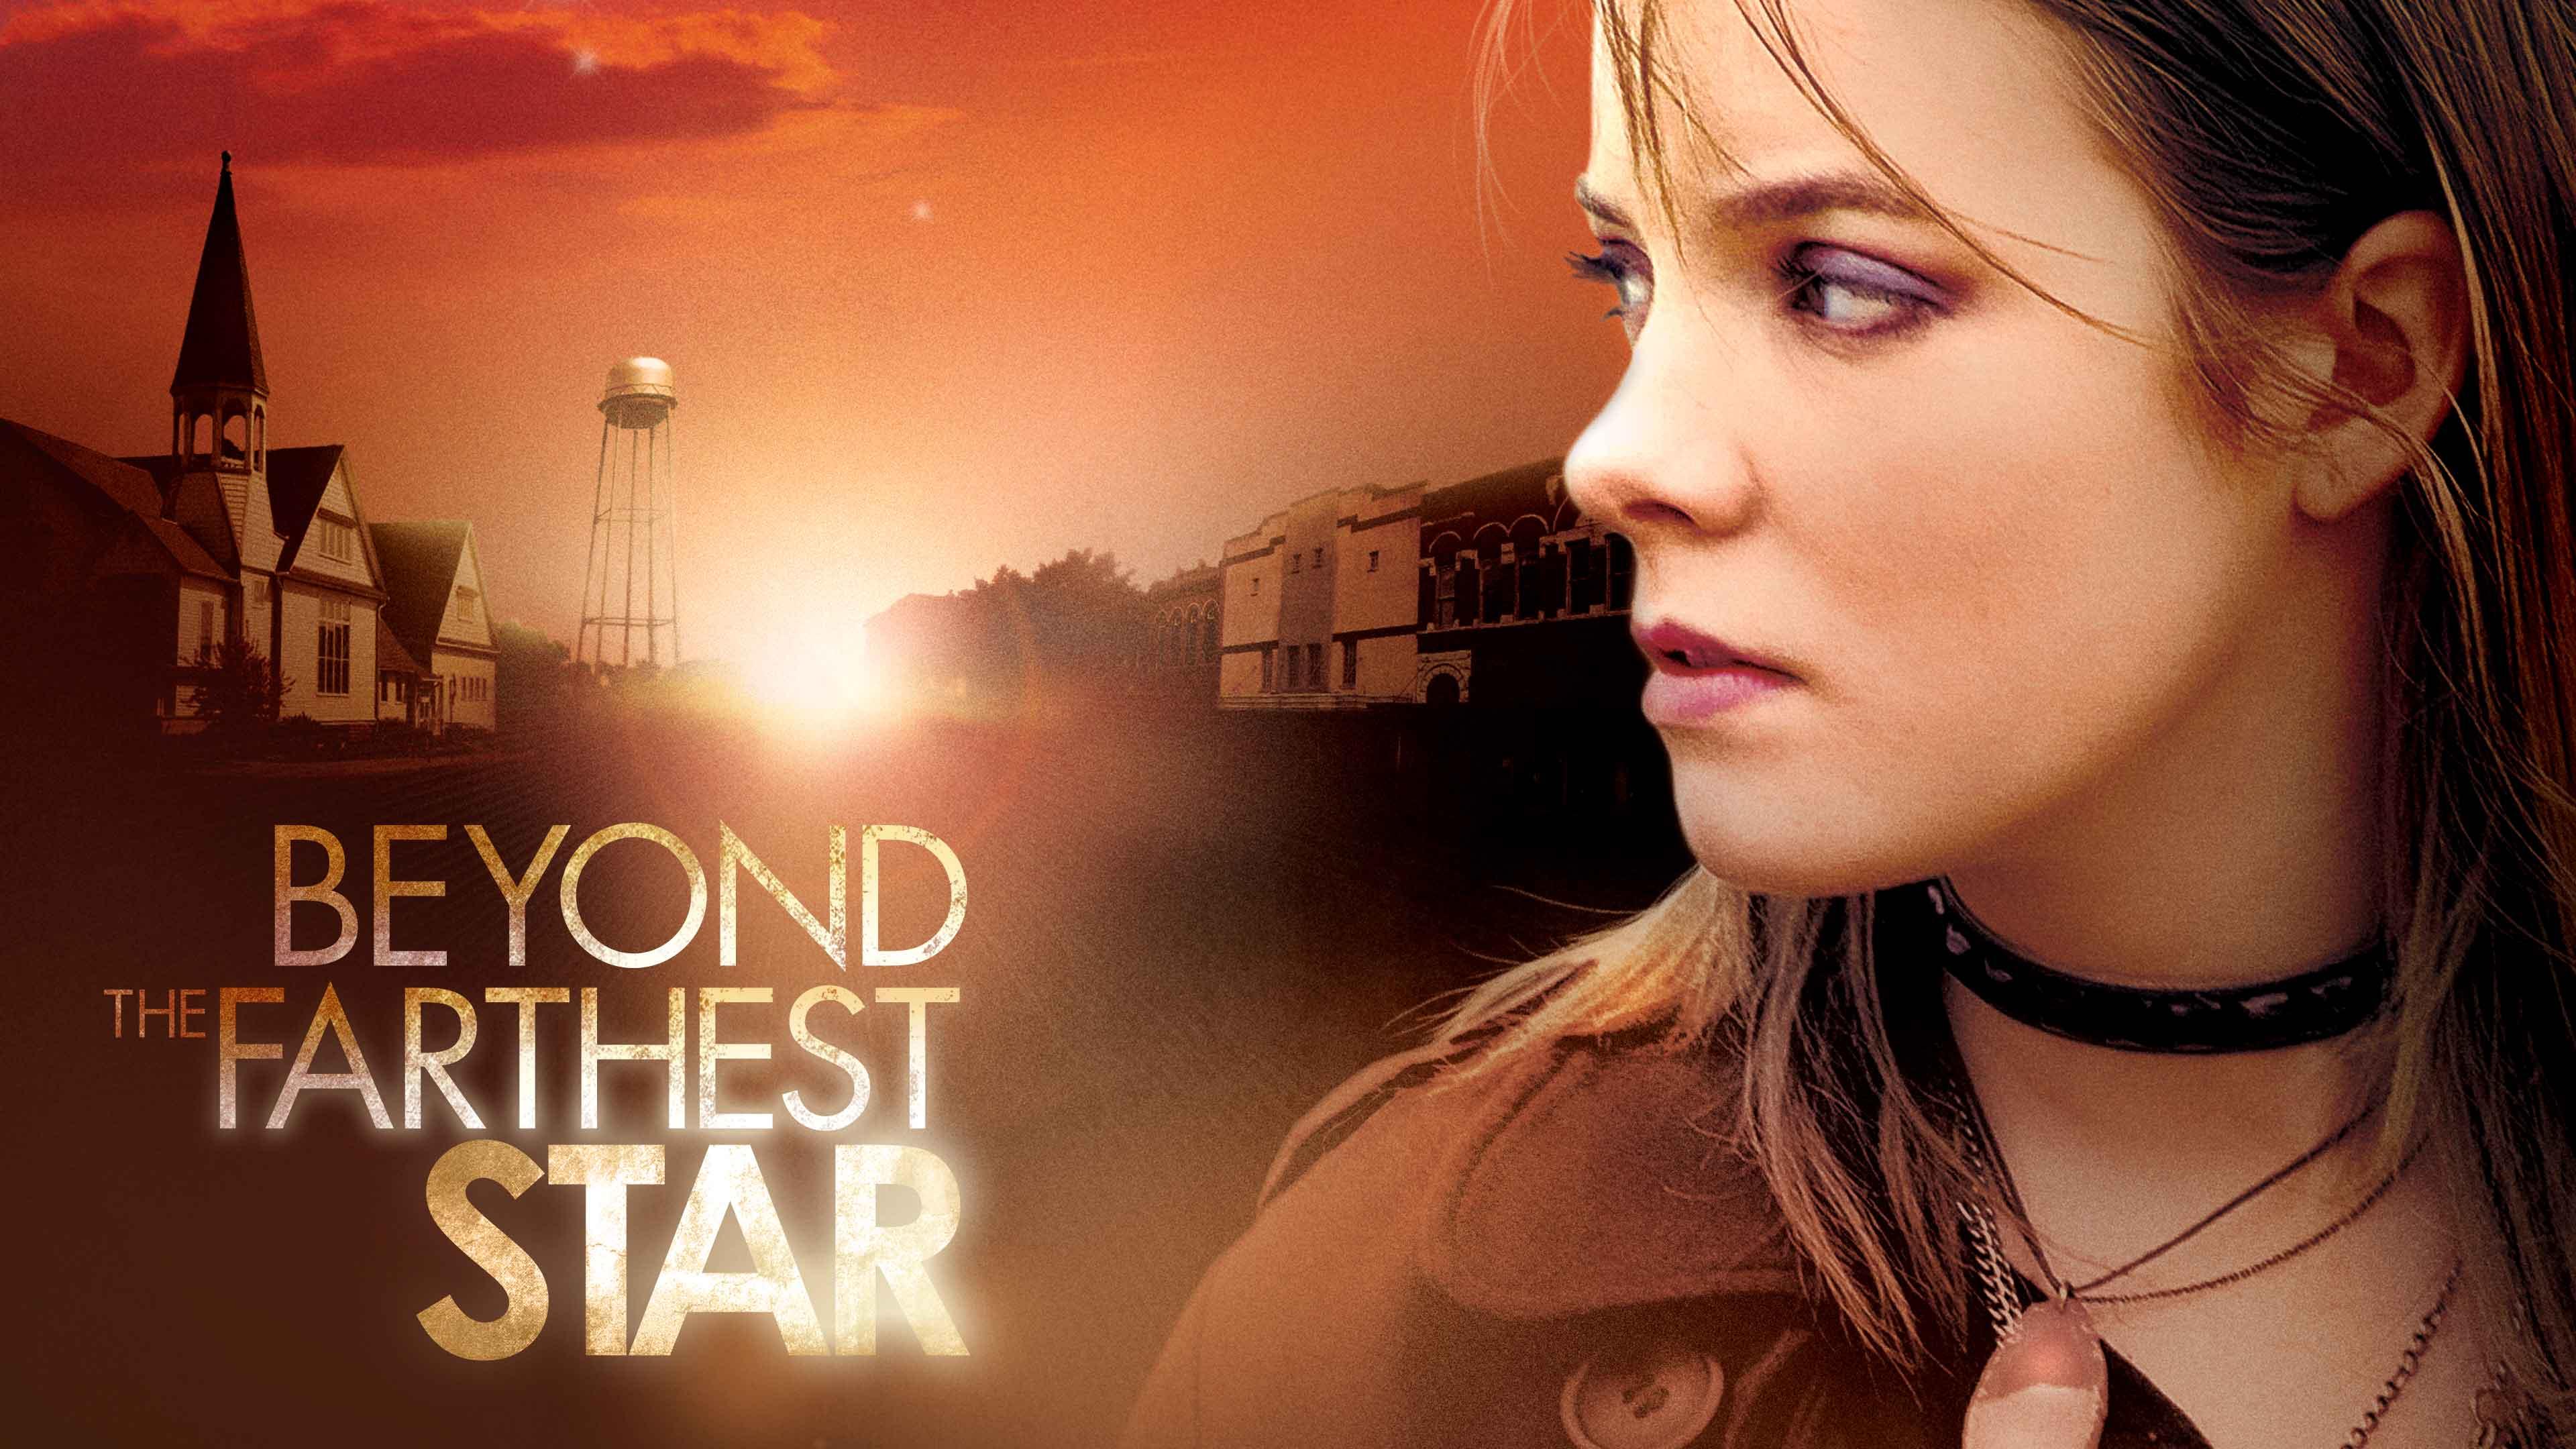 Beyond The Farthest Star Trailer